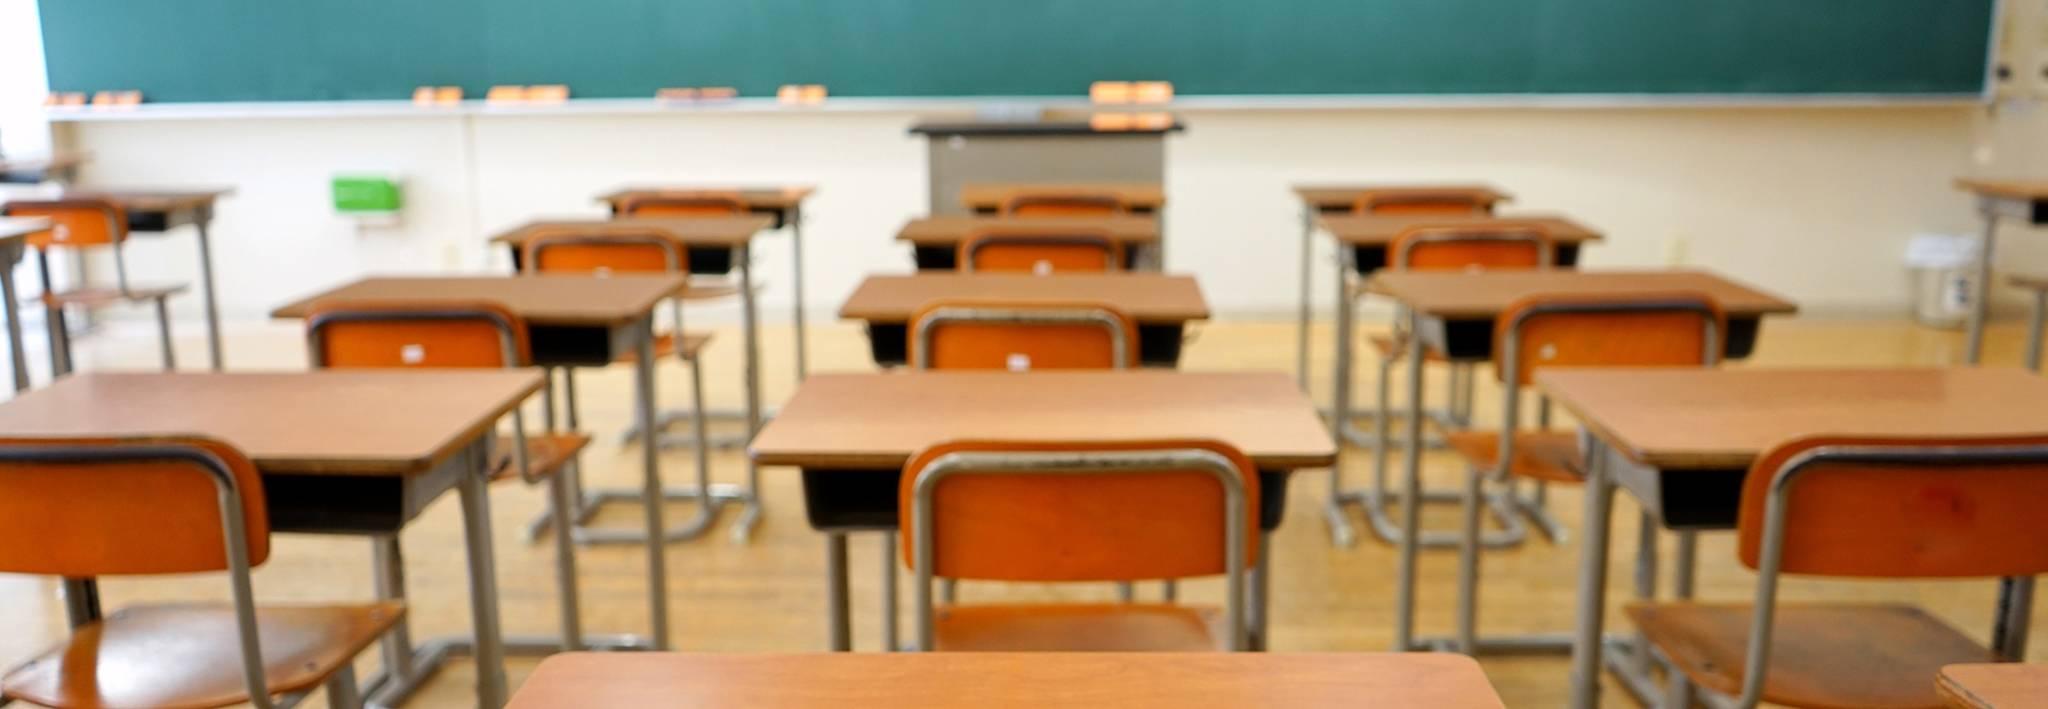 High school classroom.